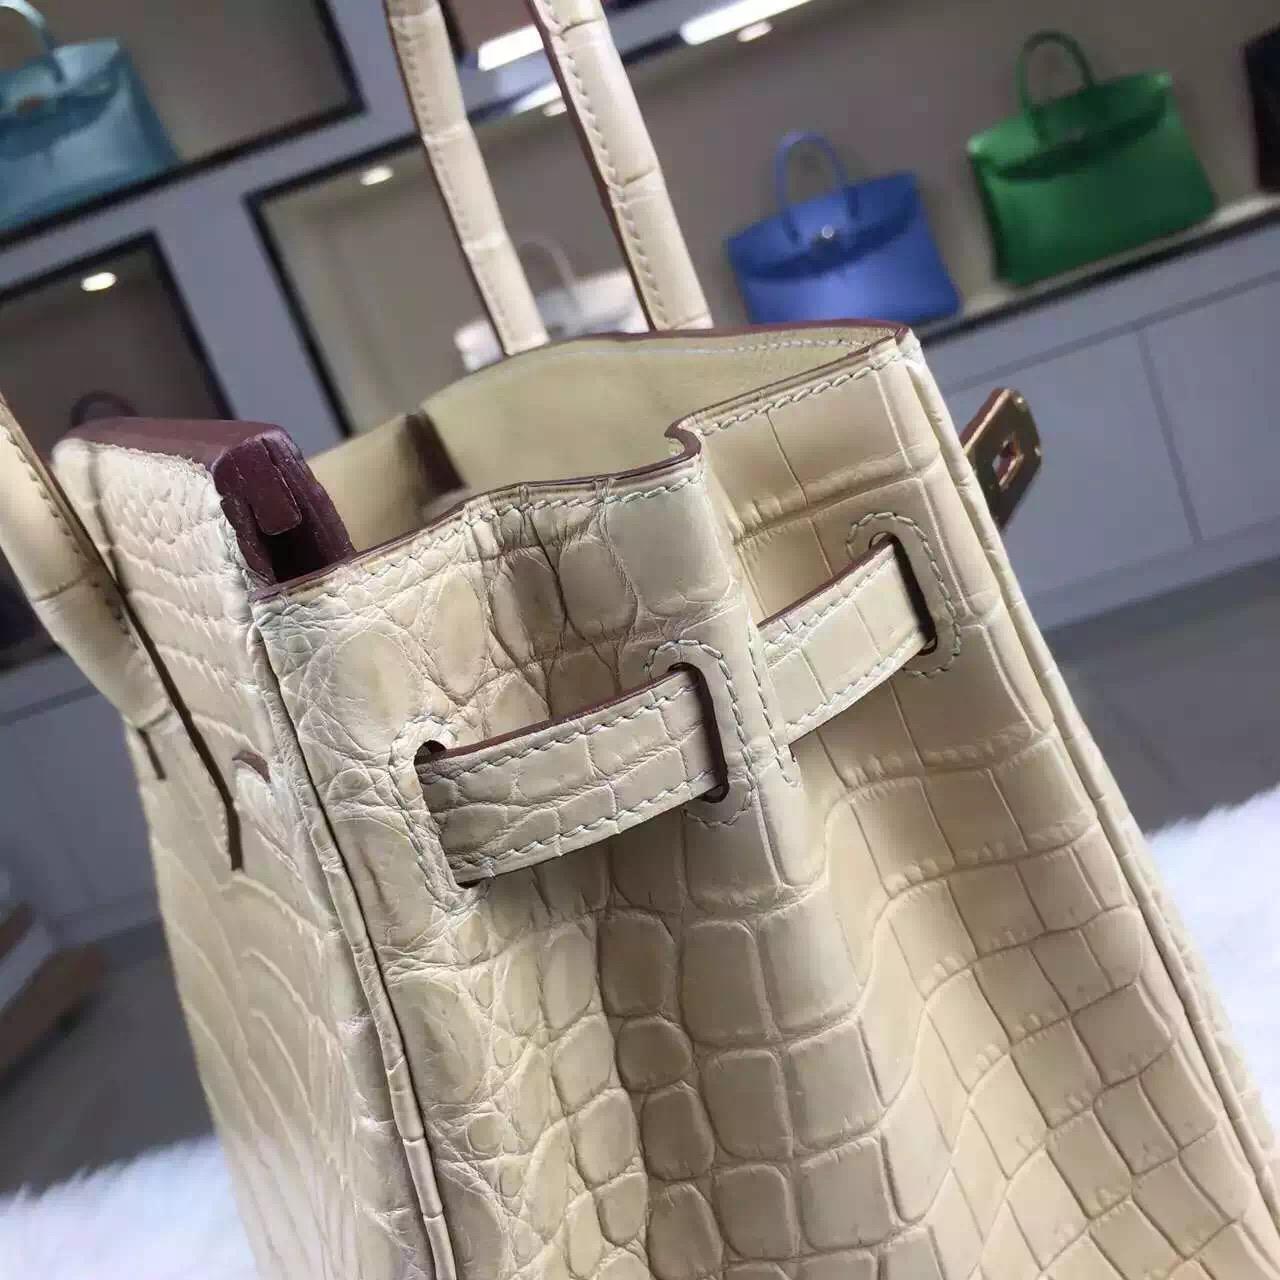 Discount Hermes Crocodile Matt Leather Birkin Bag 30CM in Apricot Ladies' Tote Bag